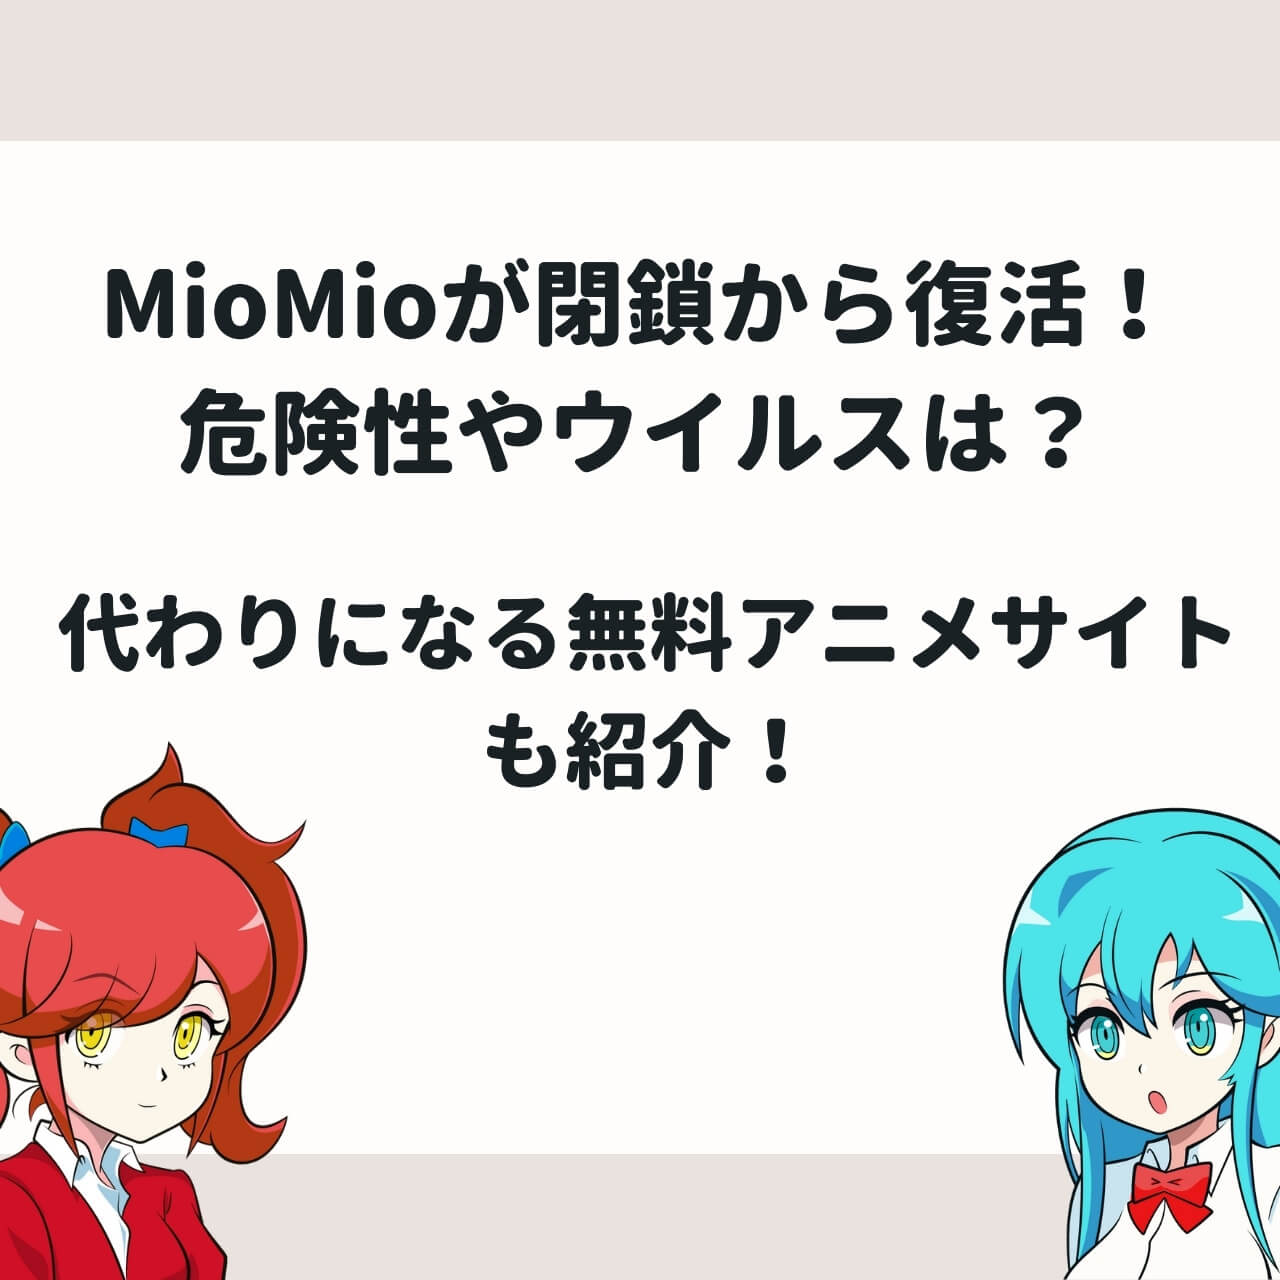 miomioが閉鎖から復活!危険性やウイルスは?代わりになる無料アニメサイトも紹介